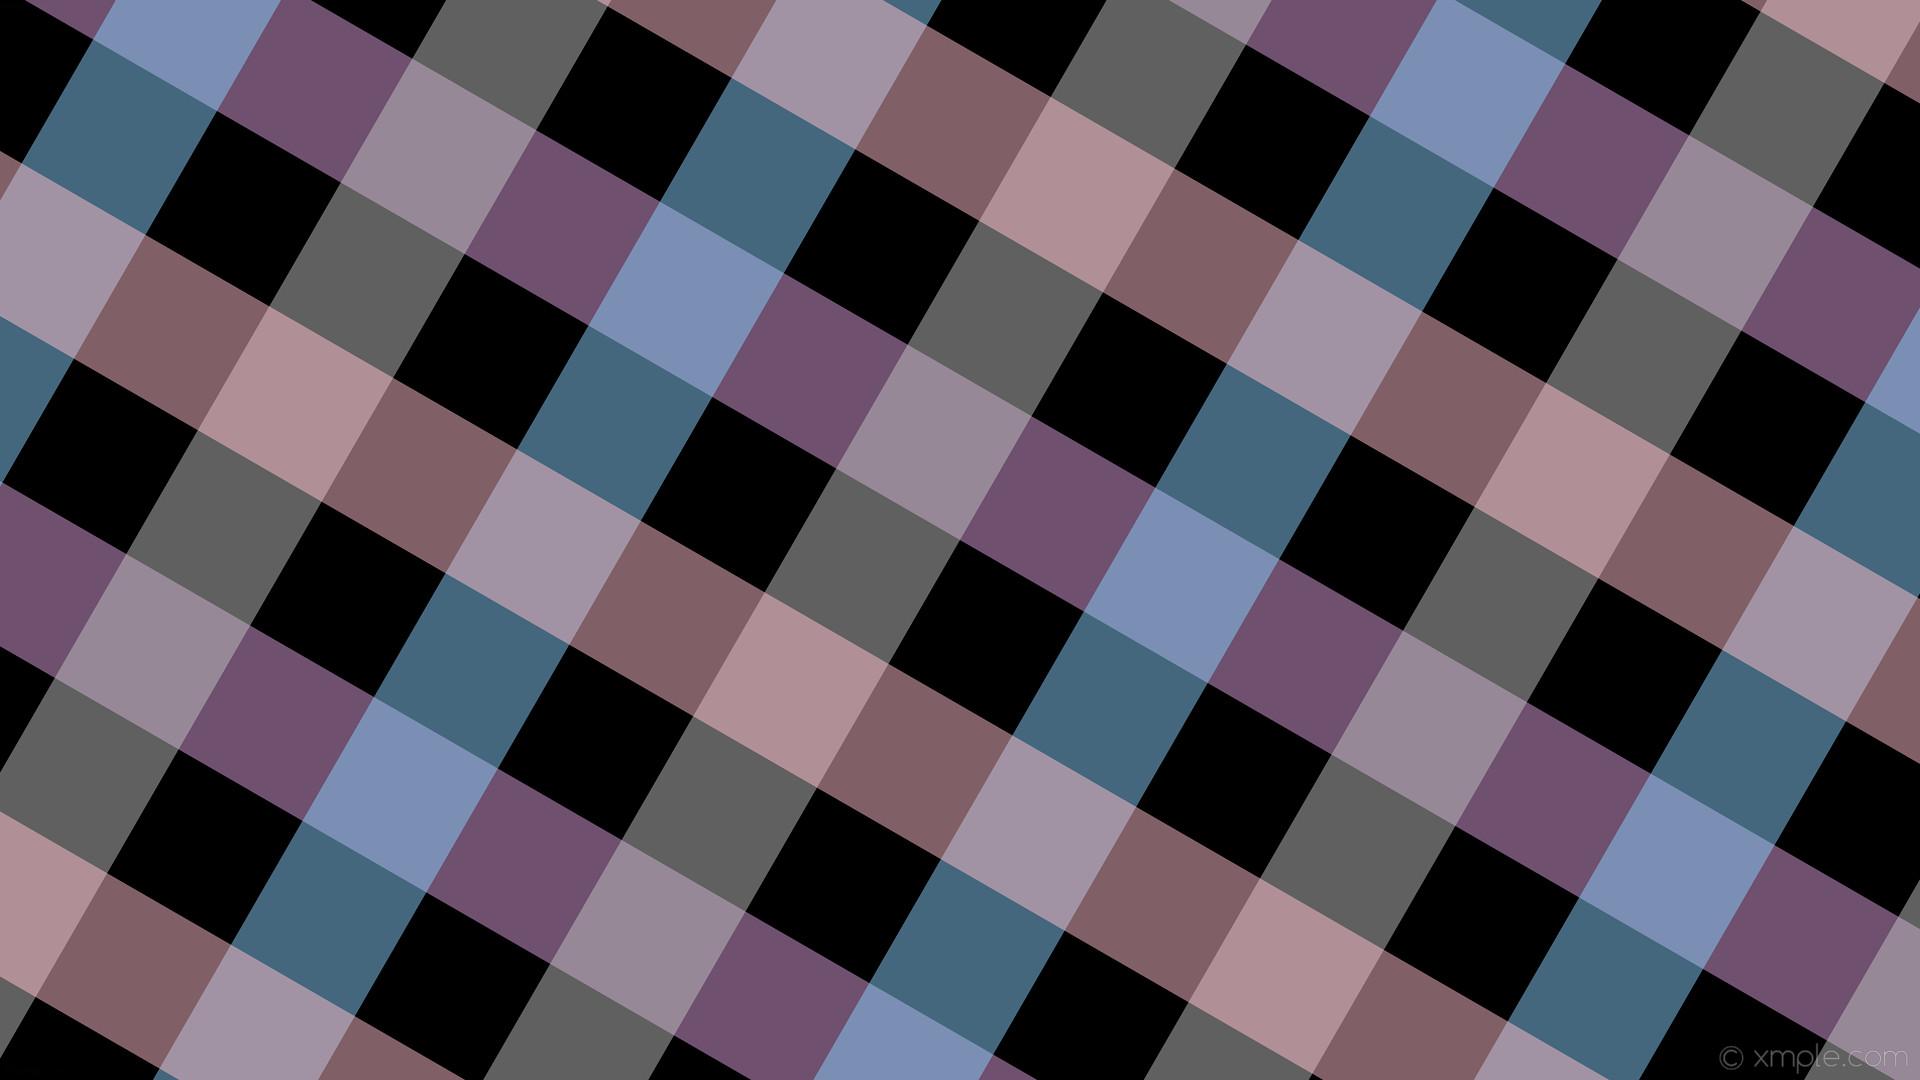 wallpaper purple blue pink striped penta gingham black grey plum silver  light sky blue #000000